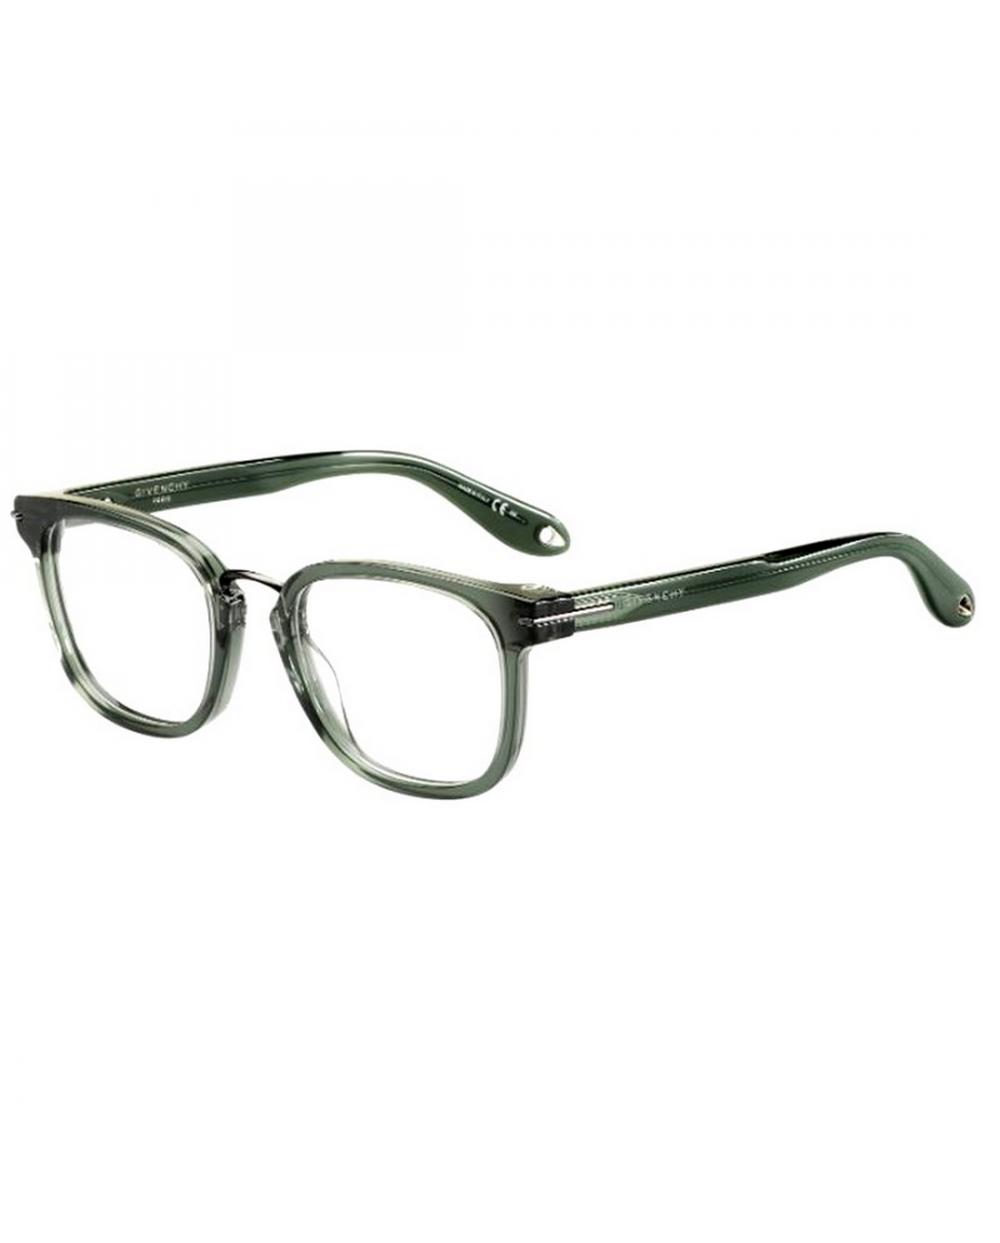 Glasses Givenchy eyewear GV0033 original packaging warranty italy